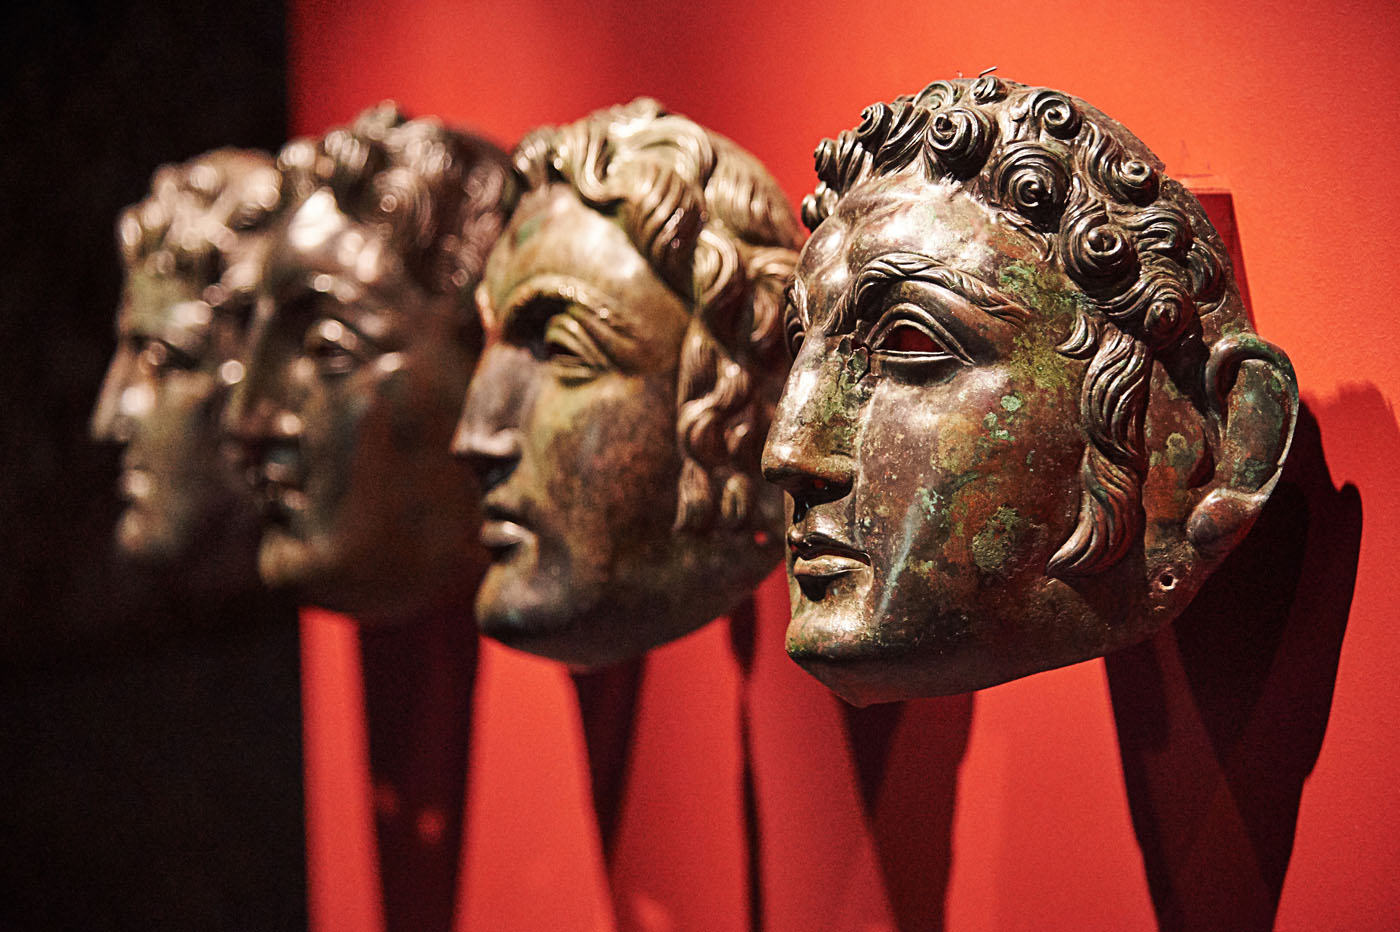 m Gäubodenmuseum kann man den weltberühmten Straubinger Römerschatz bewundern.